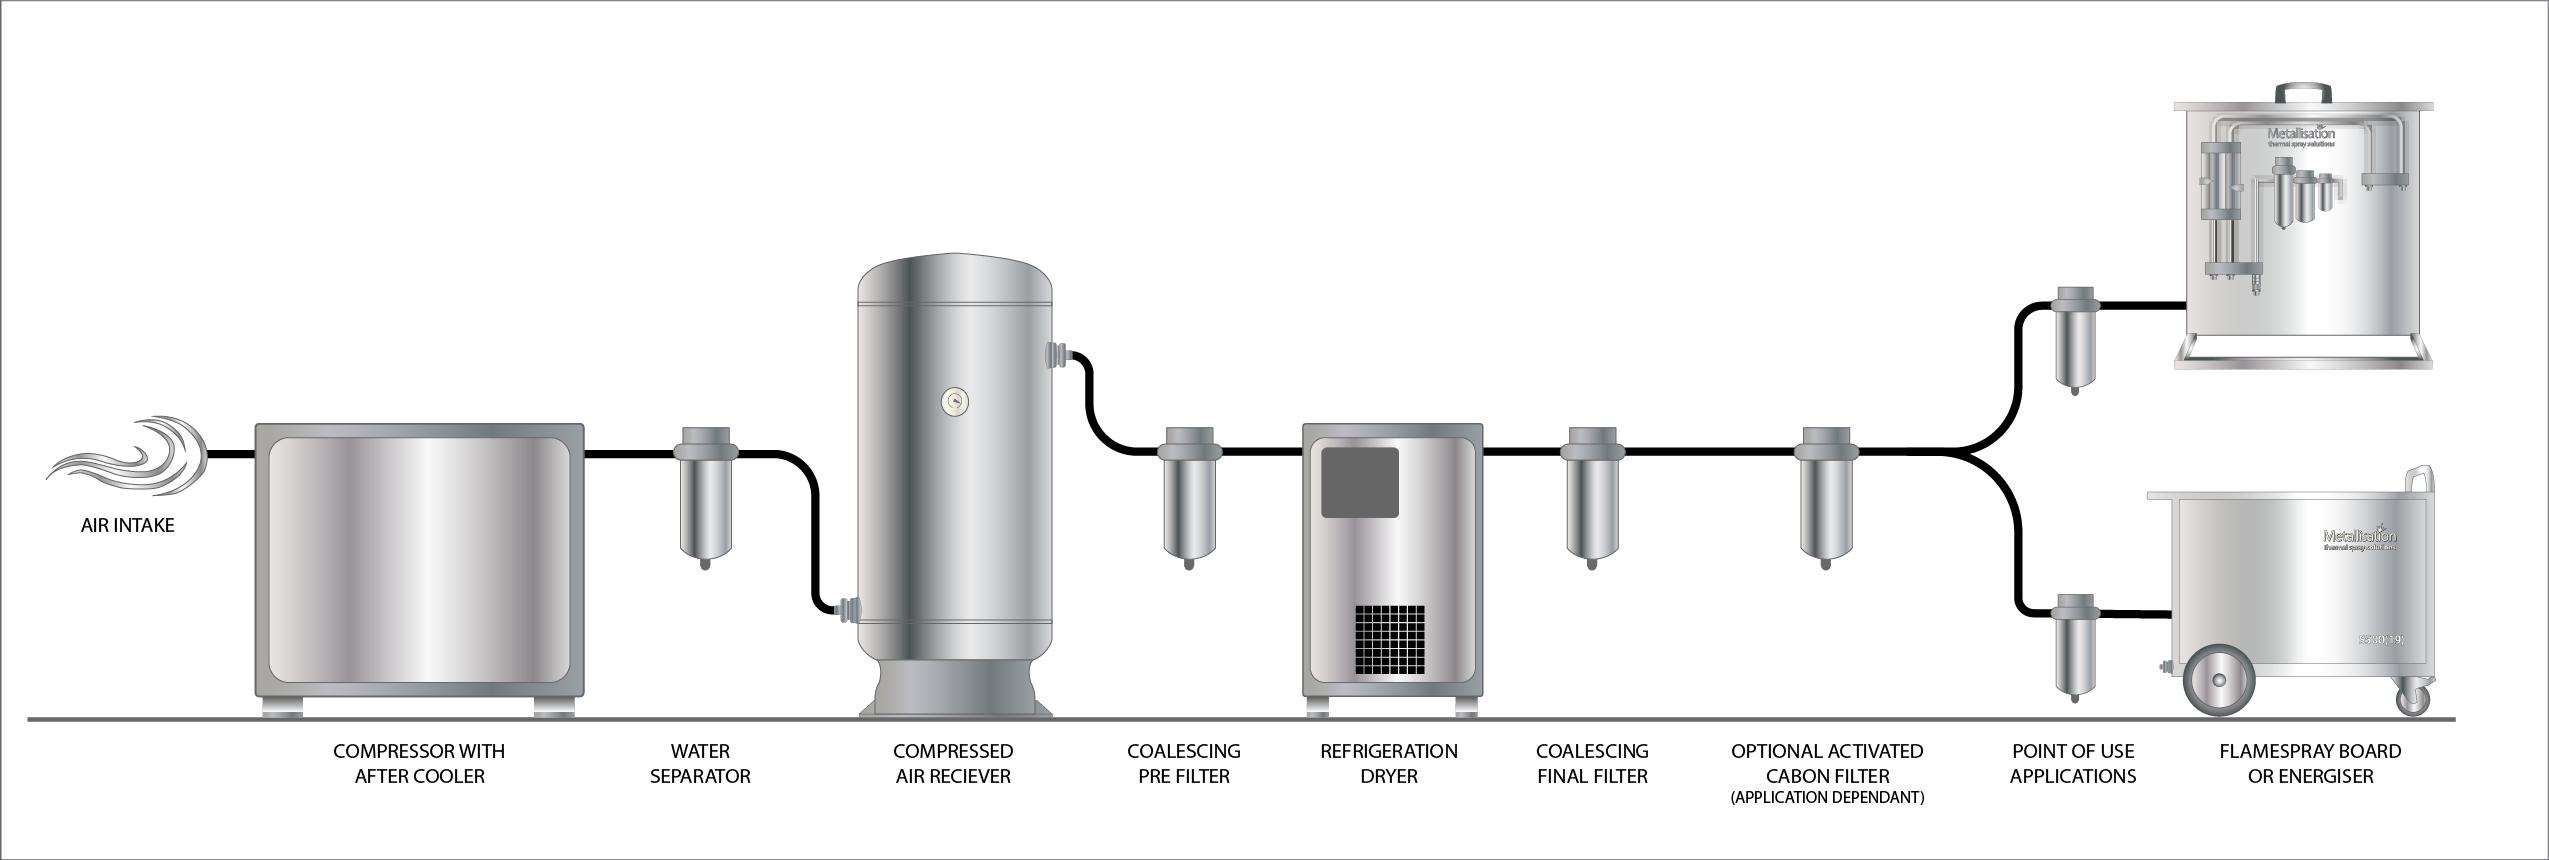 Compressed Air Setup Info Graphic